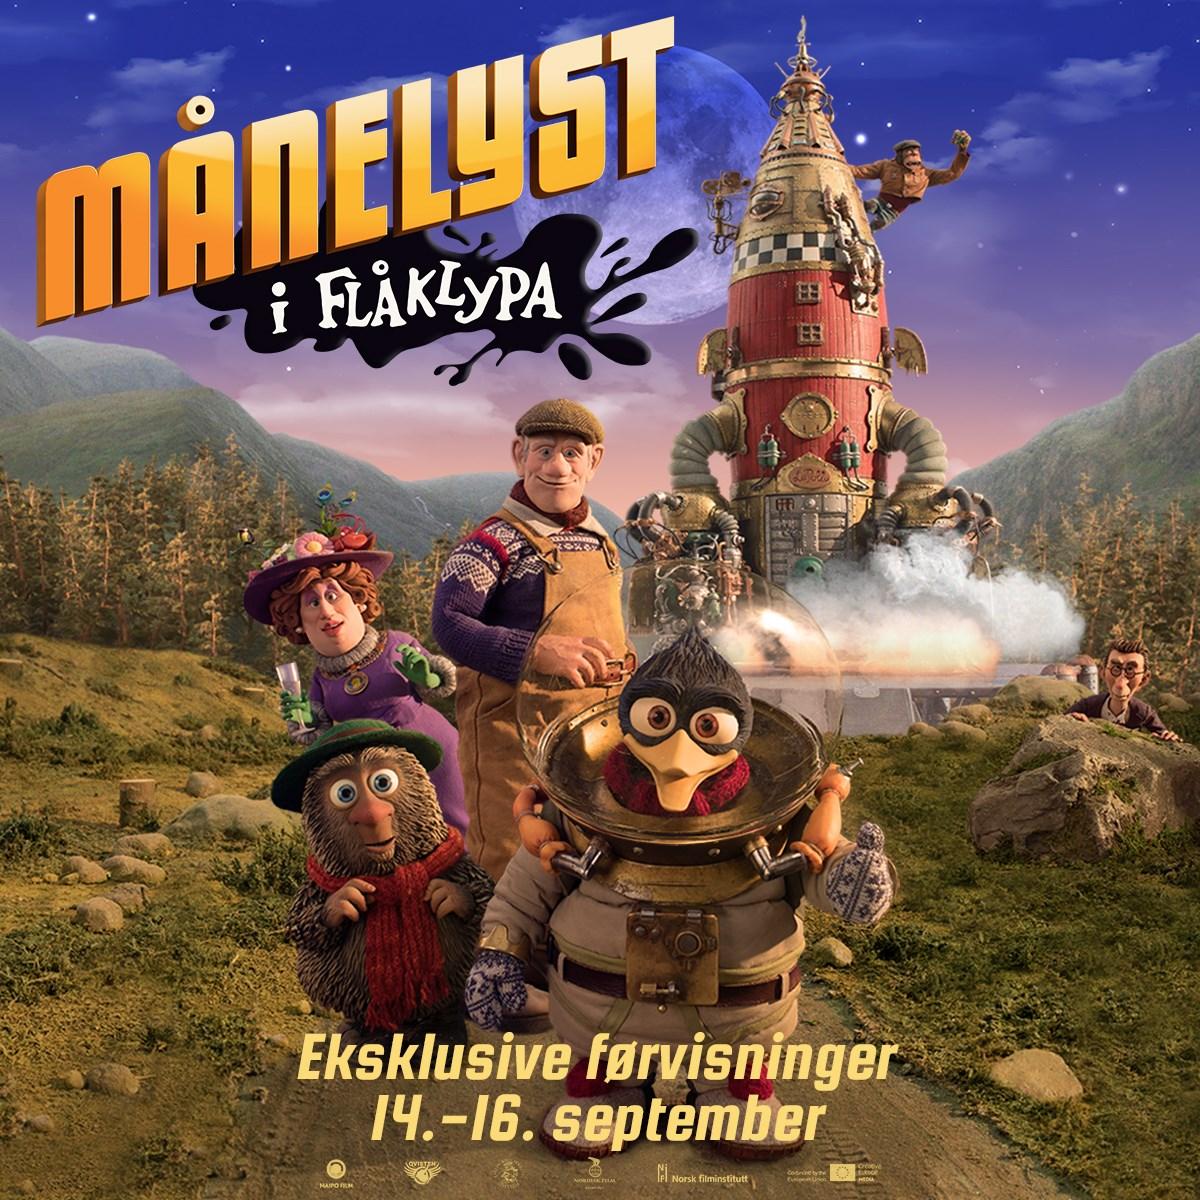 Førpremiere helg: Månelyst i Flåklypa